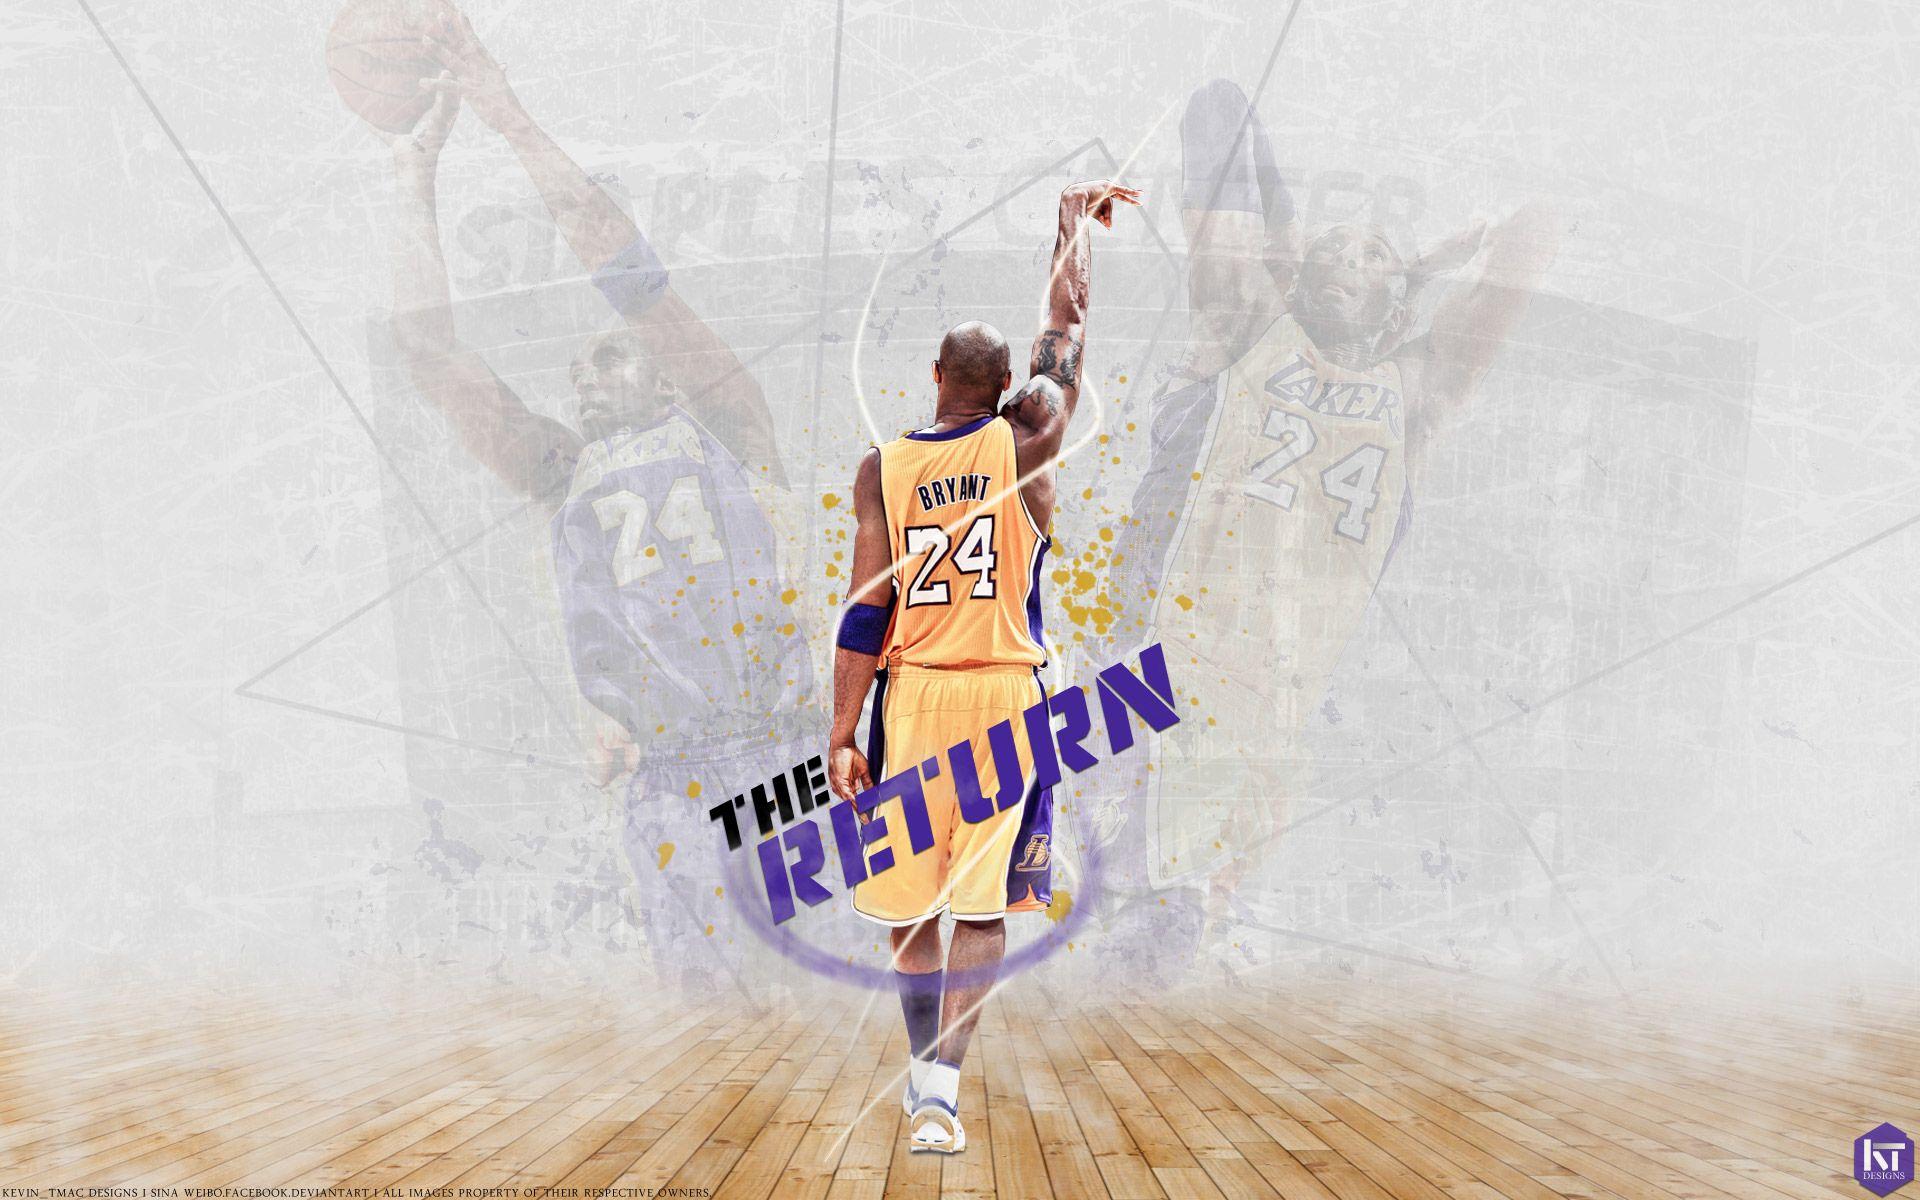 Kobe Bryant Wallpapers Hd Free Kobe Bryant Wallpaper Kobe Bryant Poster Kobe Bryant